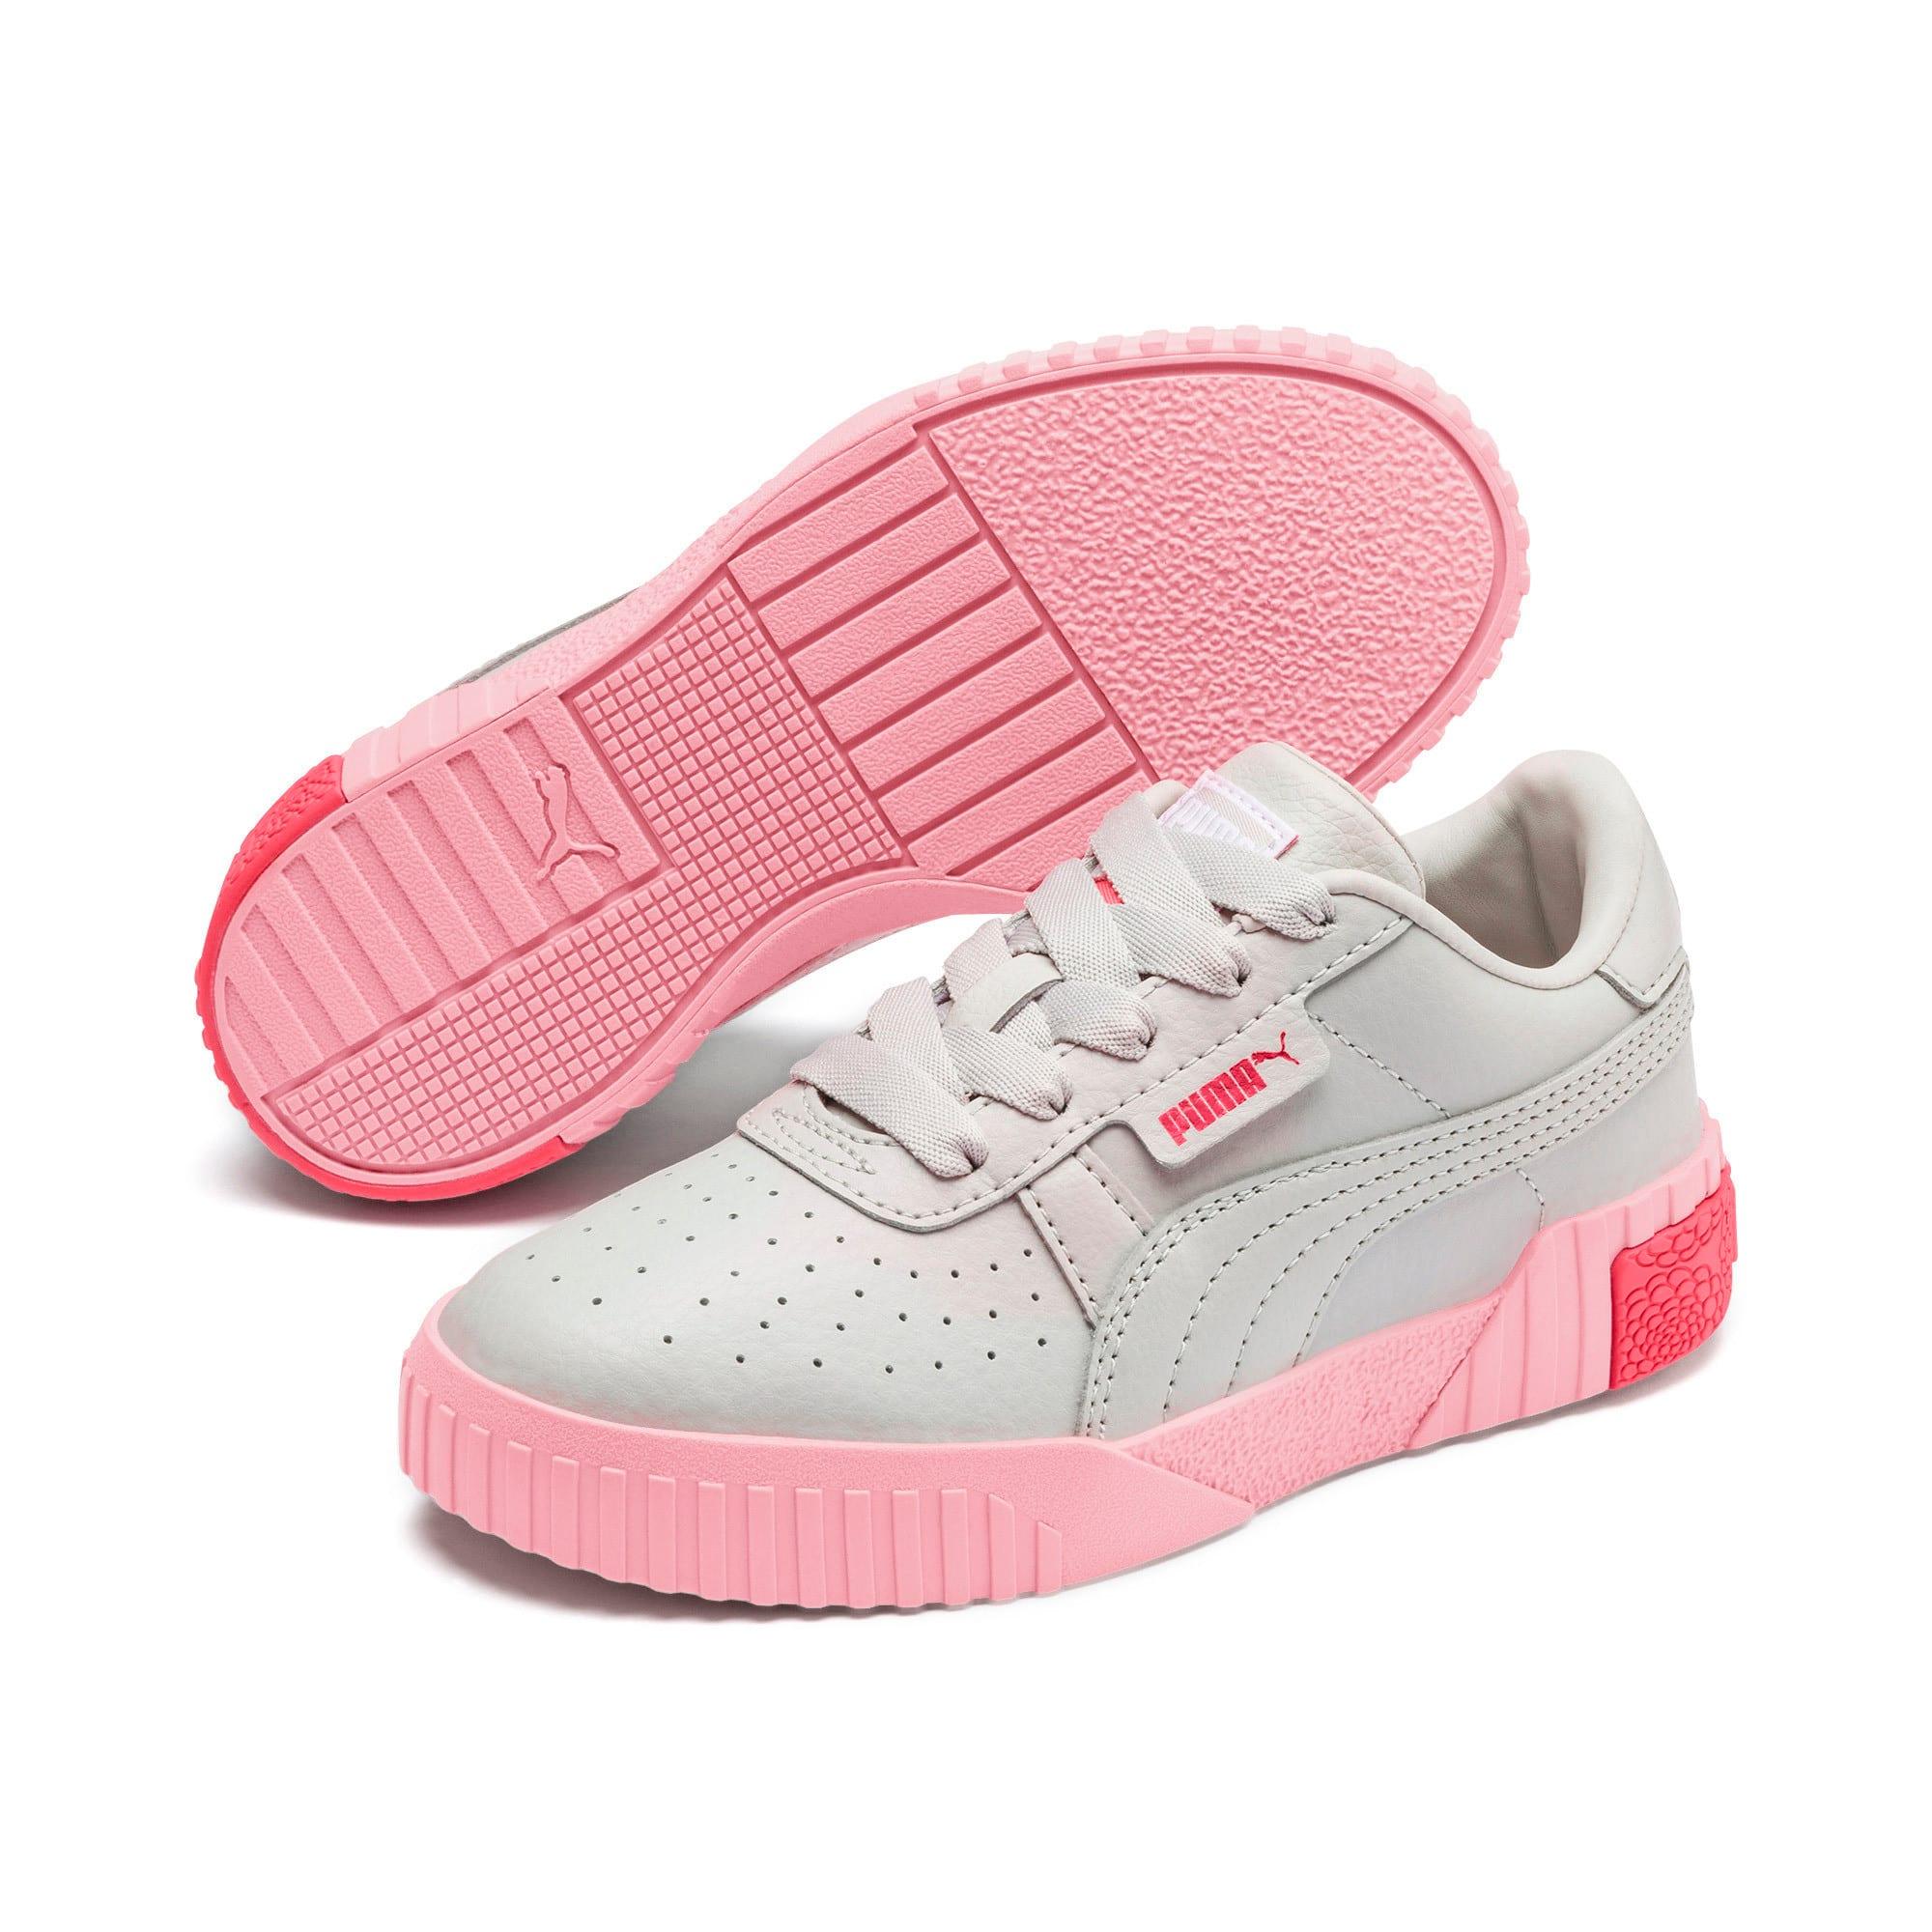 Thumbnail 2 of Cali Kids' Mädchen Sneaker, Gray Violet-Calypso Coral, medium